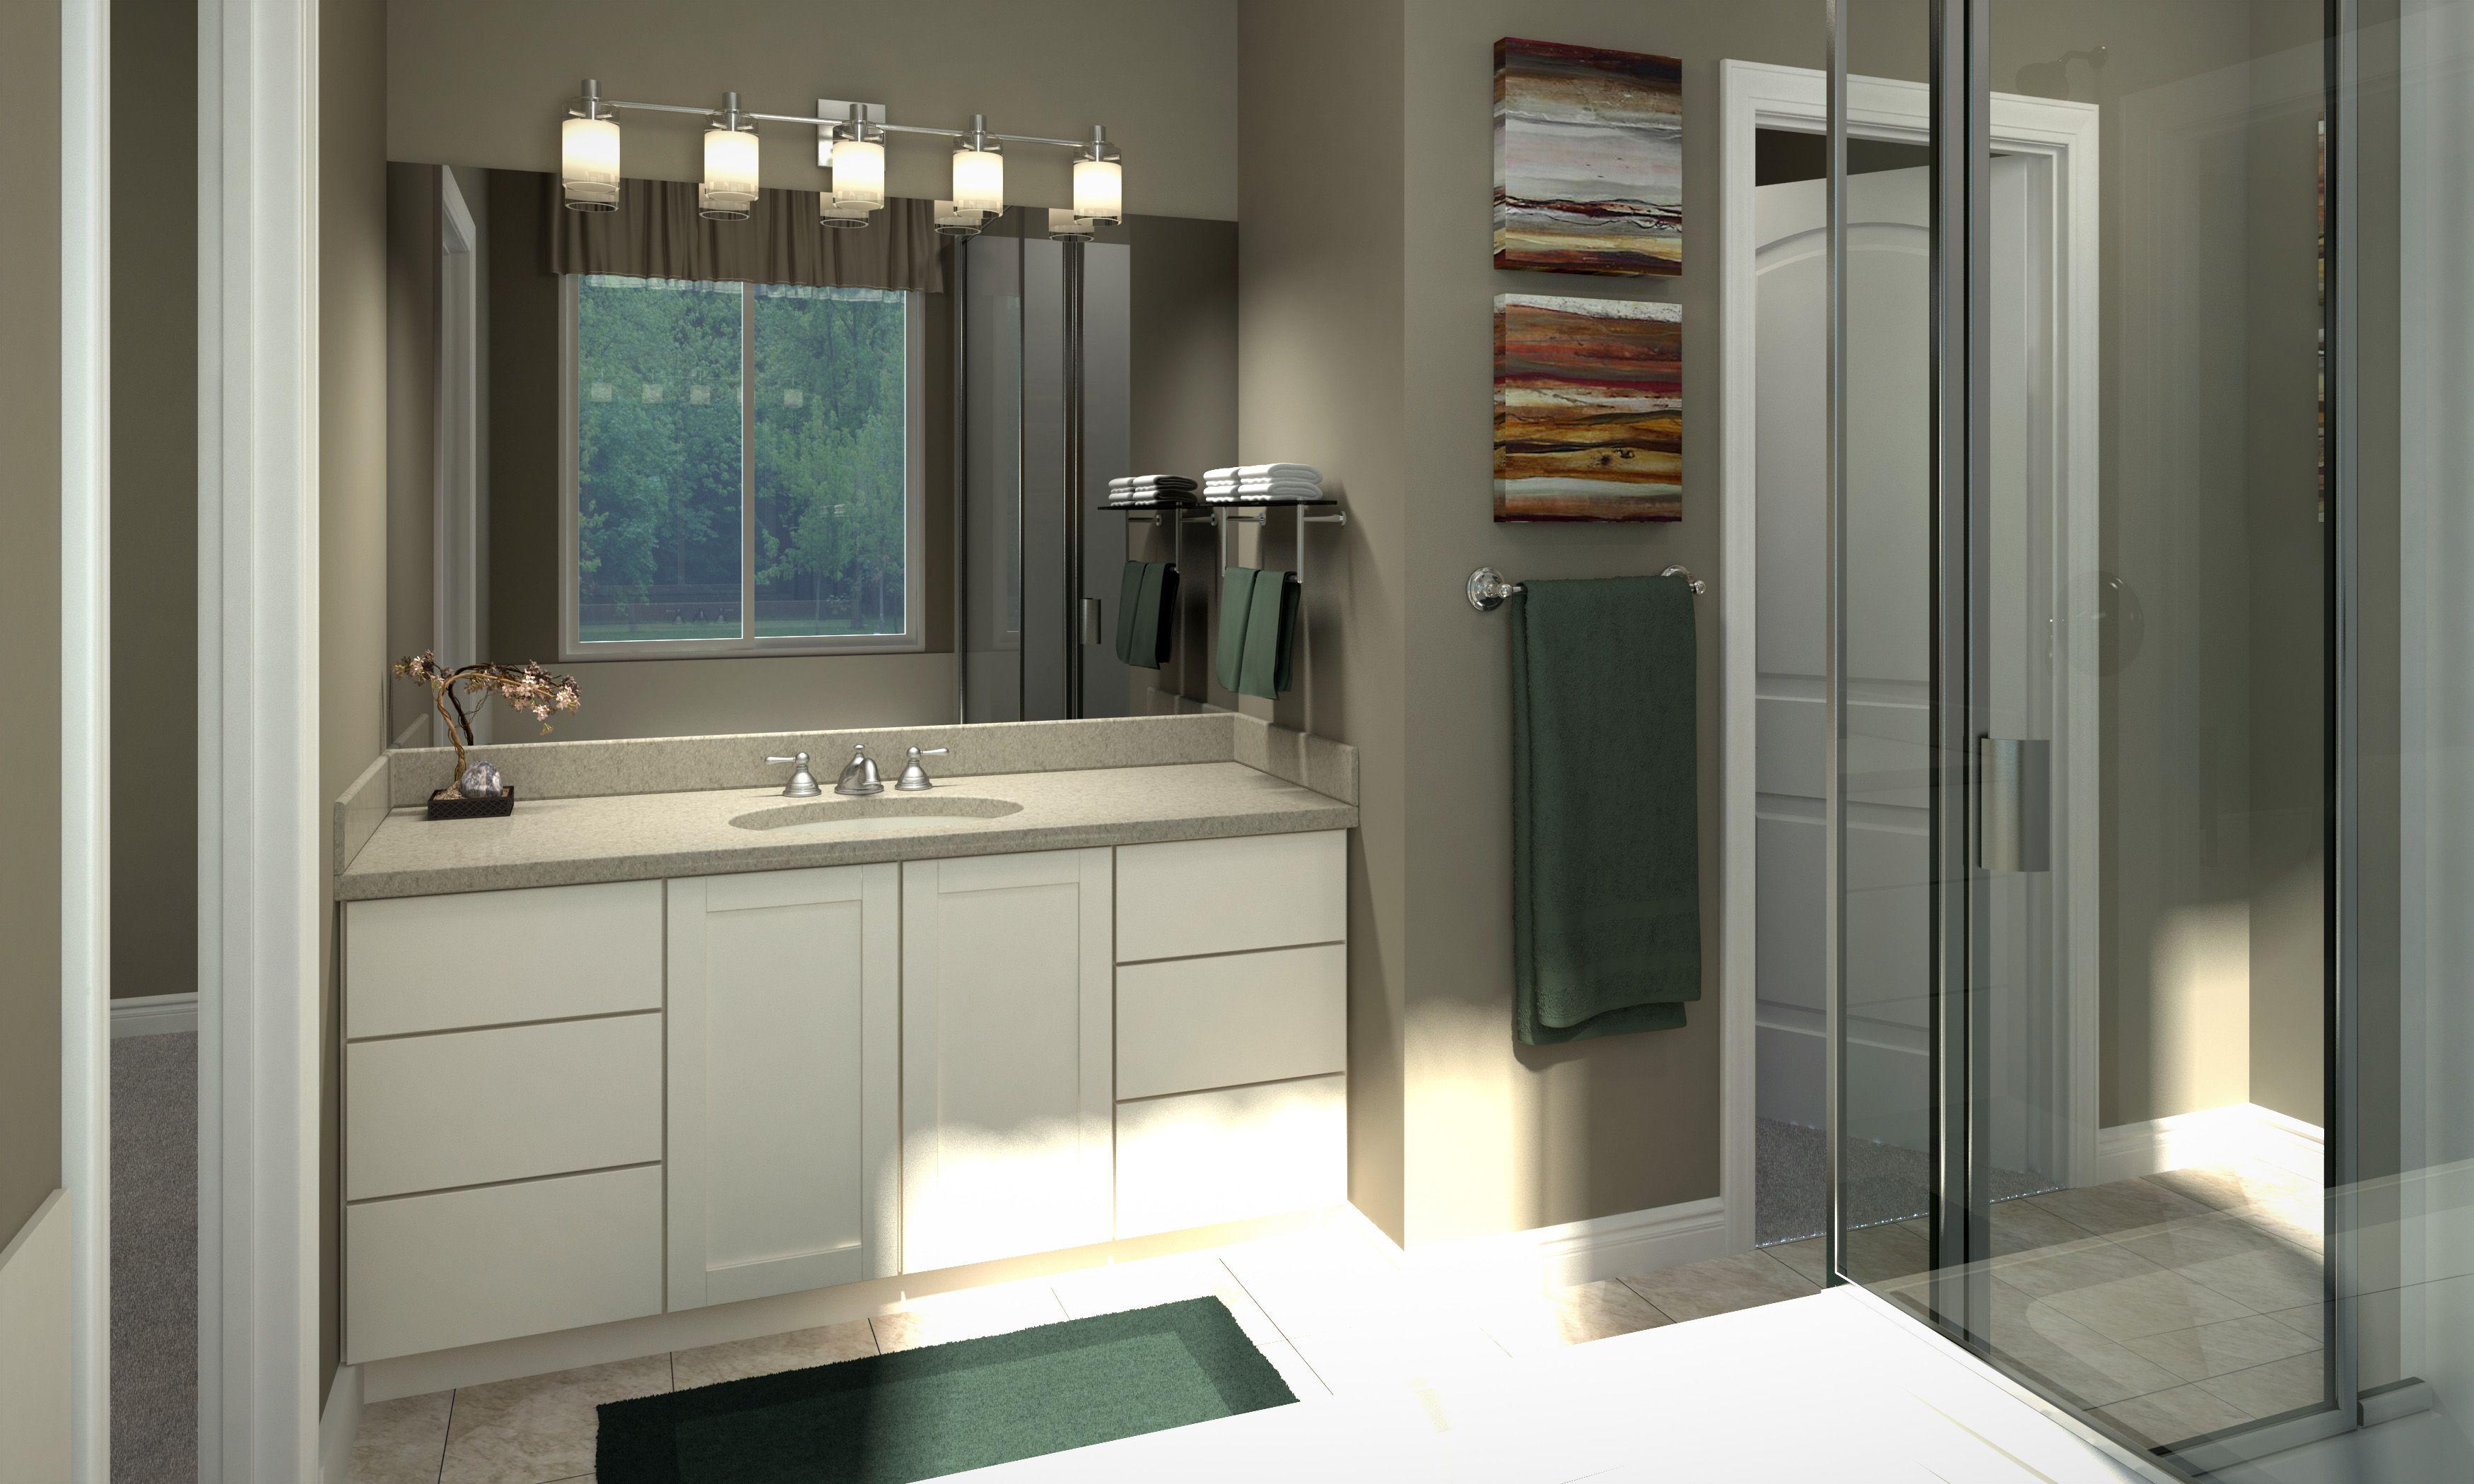 Sarena Master Bathroom House floor plans, Floor plans, Home